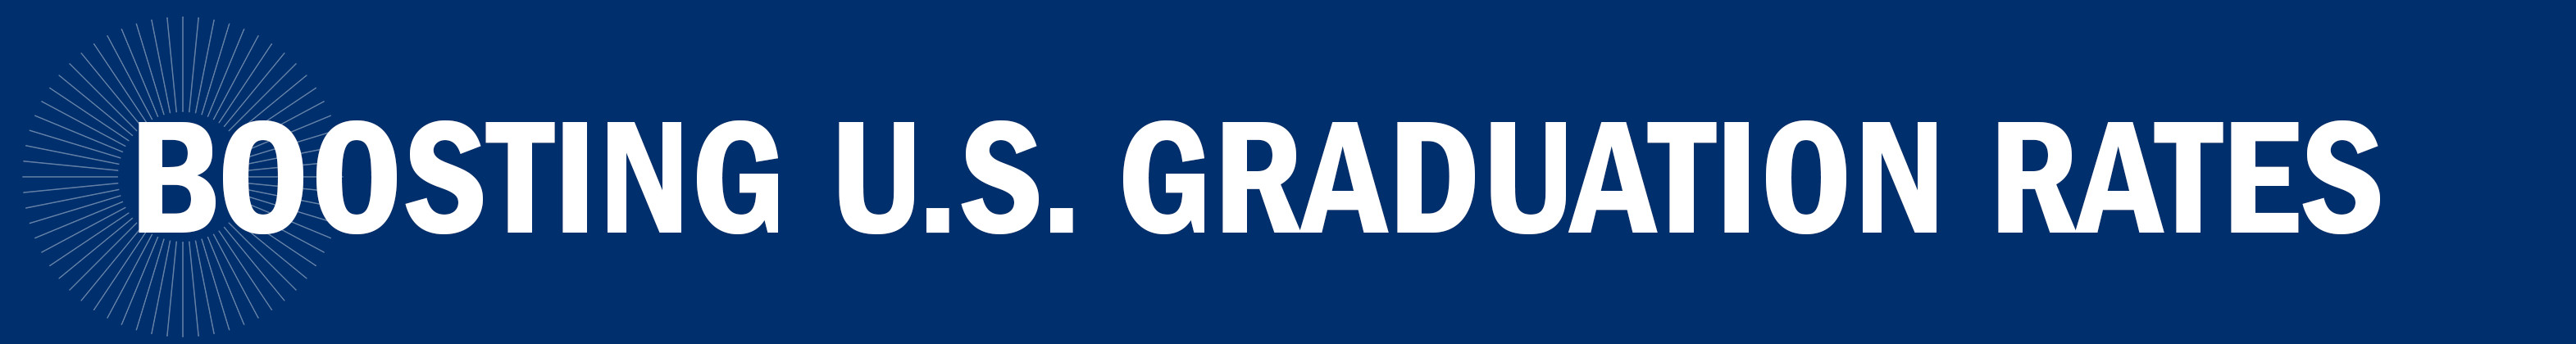 Boosting U.S. Graduation Rates